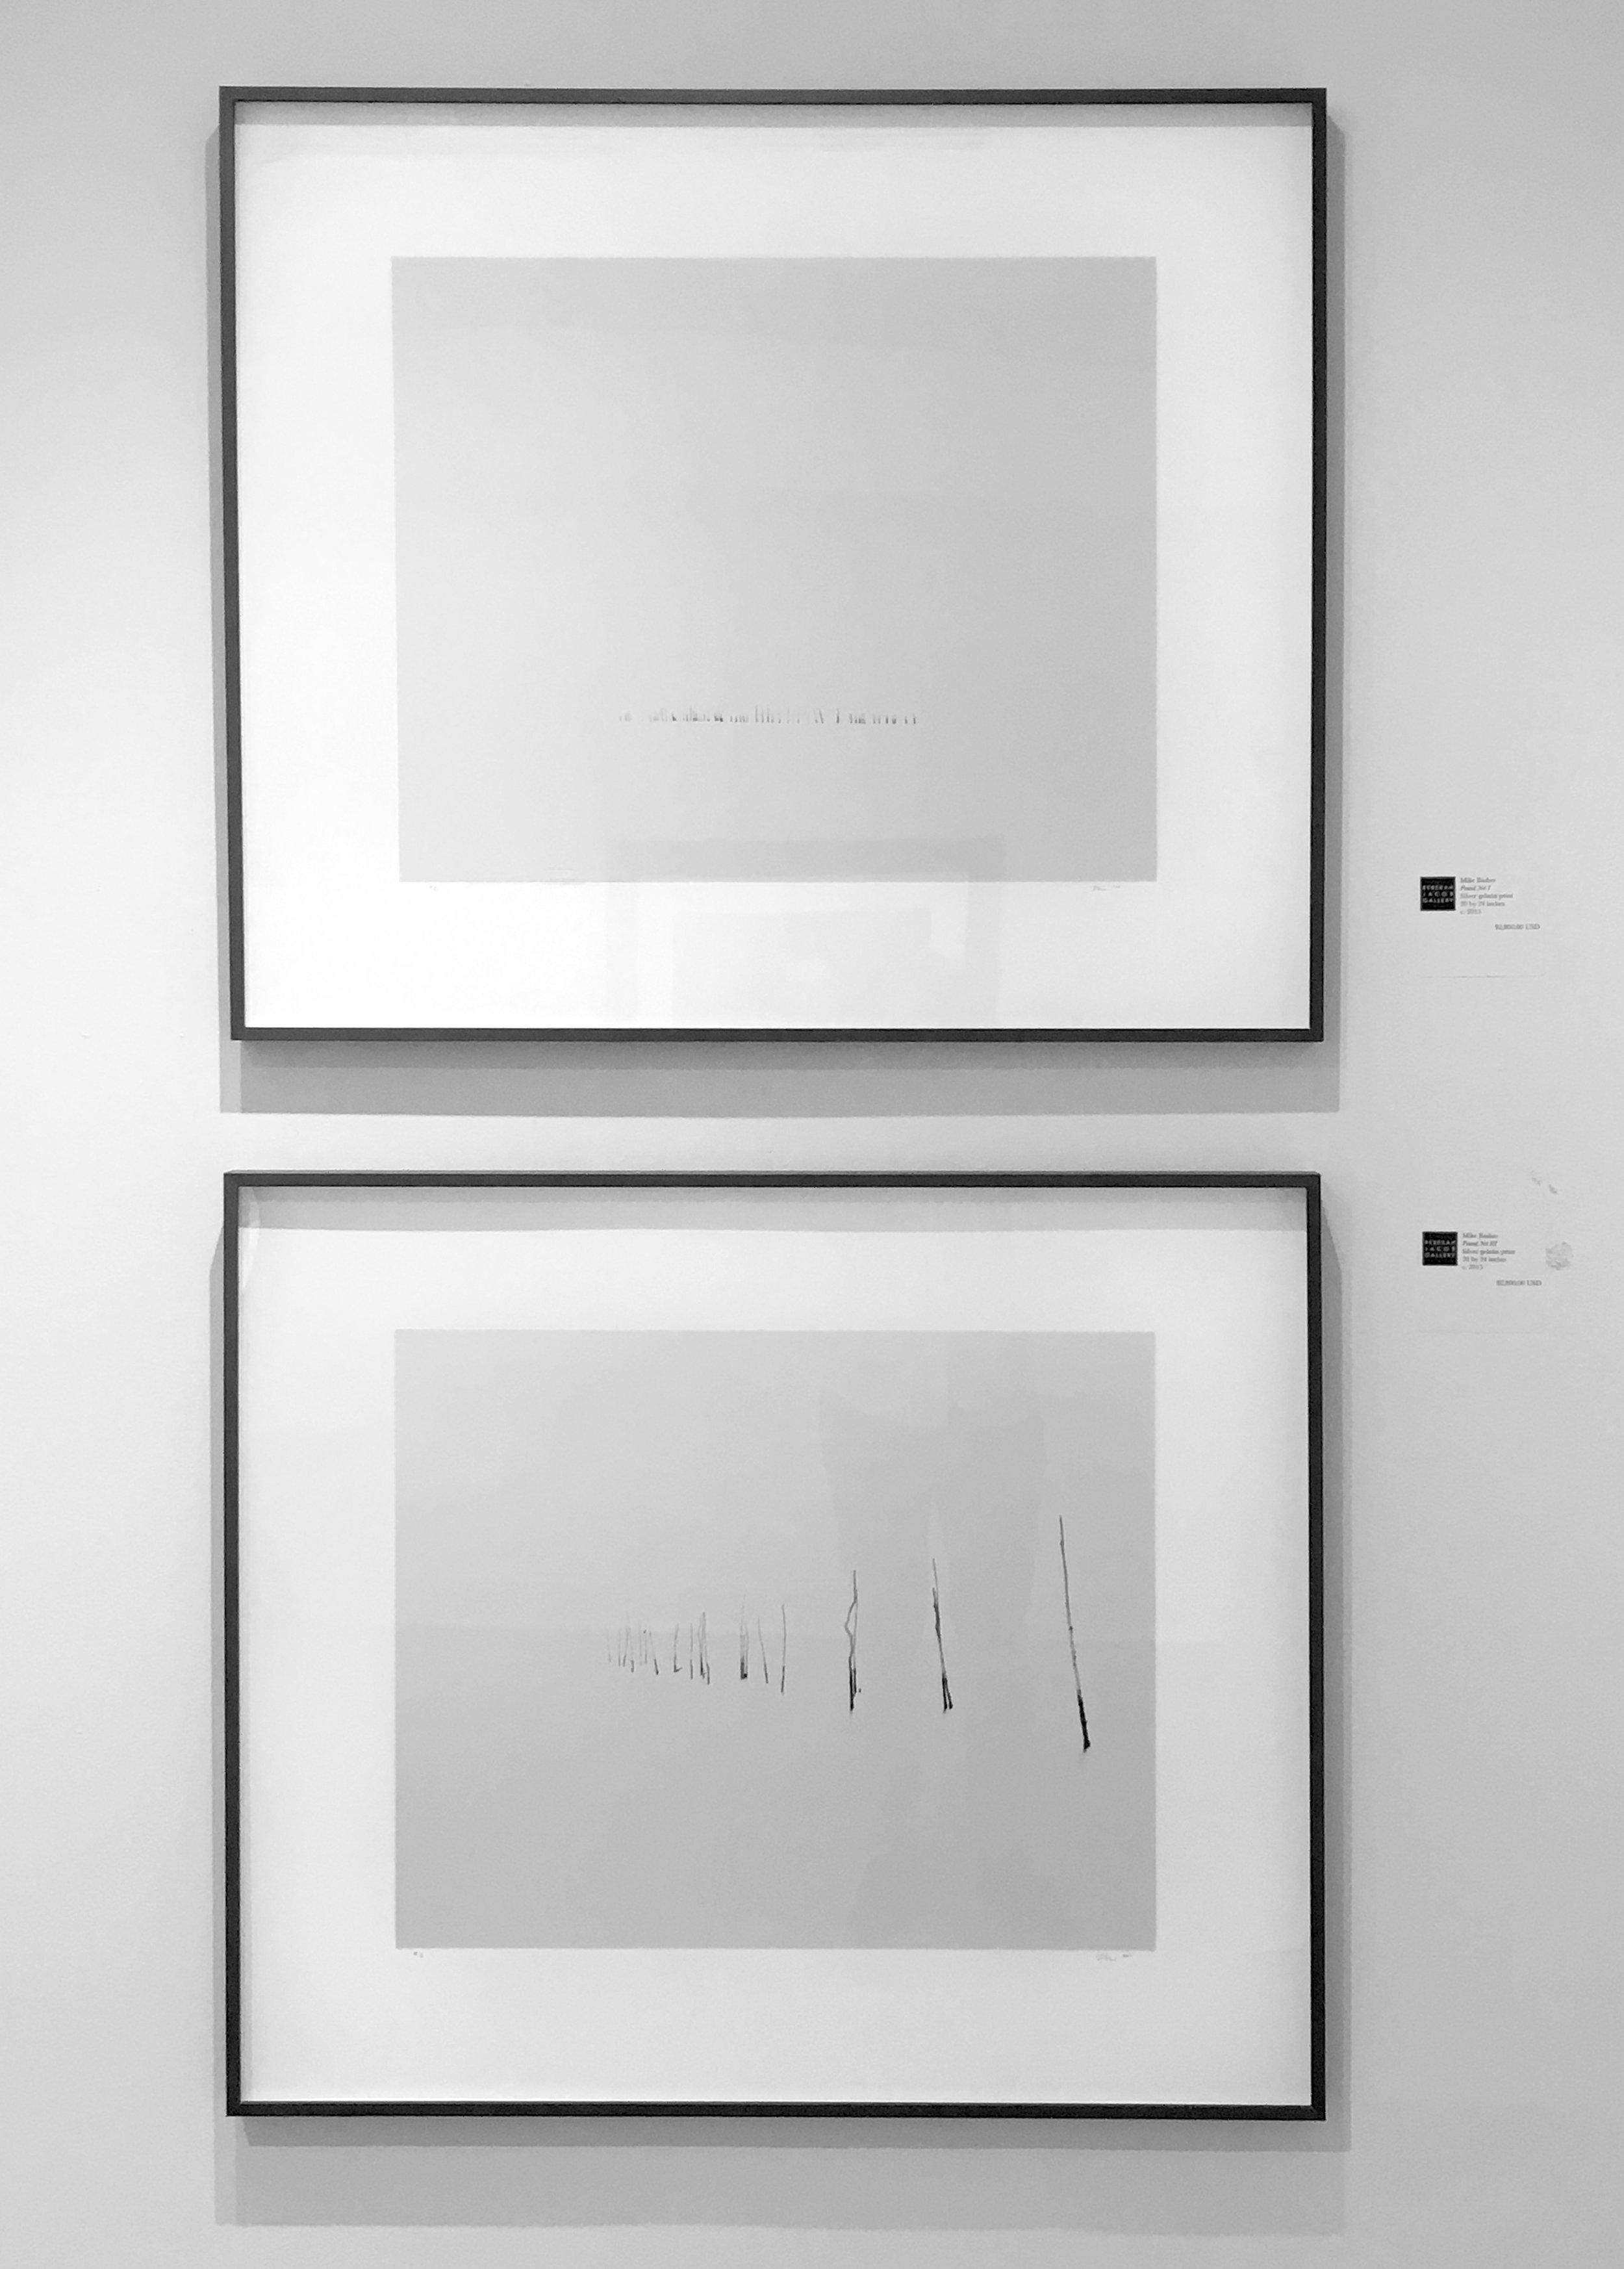 POUND NET I, 2015. 20x24 inch silver gelatin photograph (top) and POUND NET III, 2015.20x24 inch silver gelatin photograph (bottom)